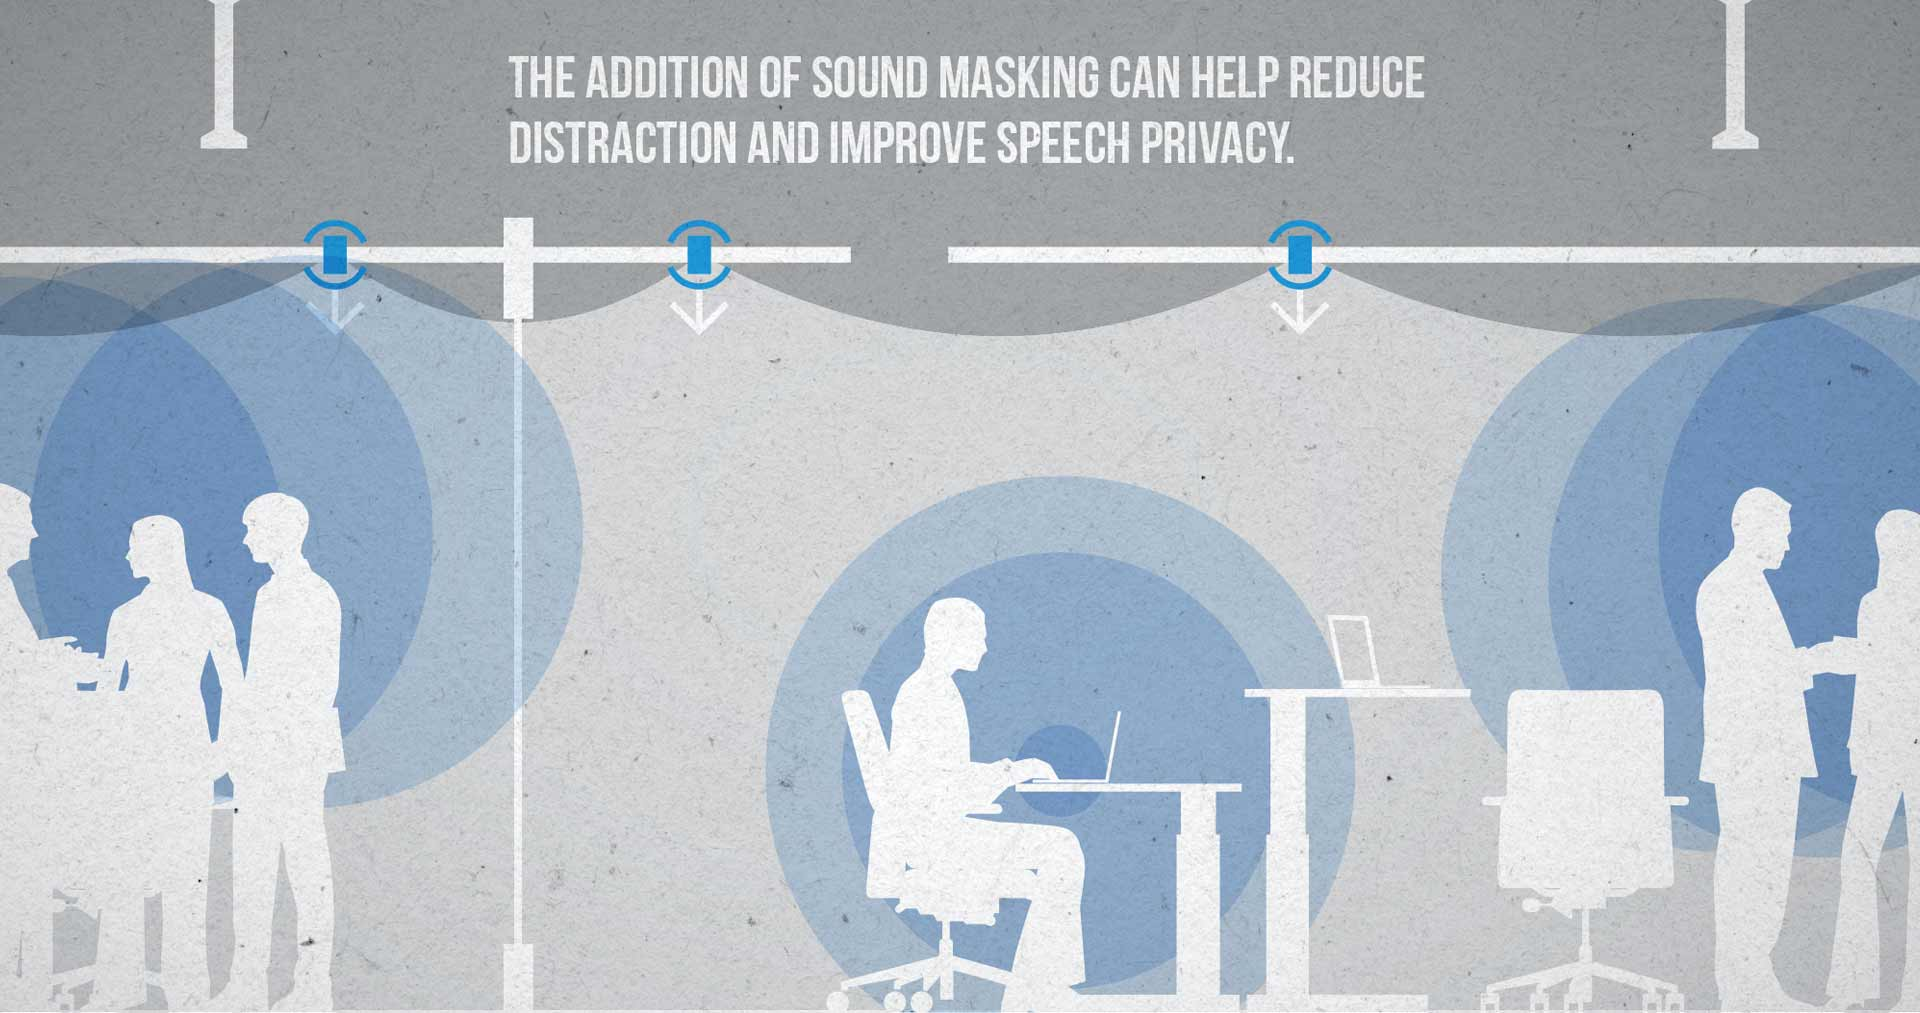 soundmasking-infographic-dl16